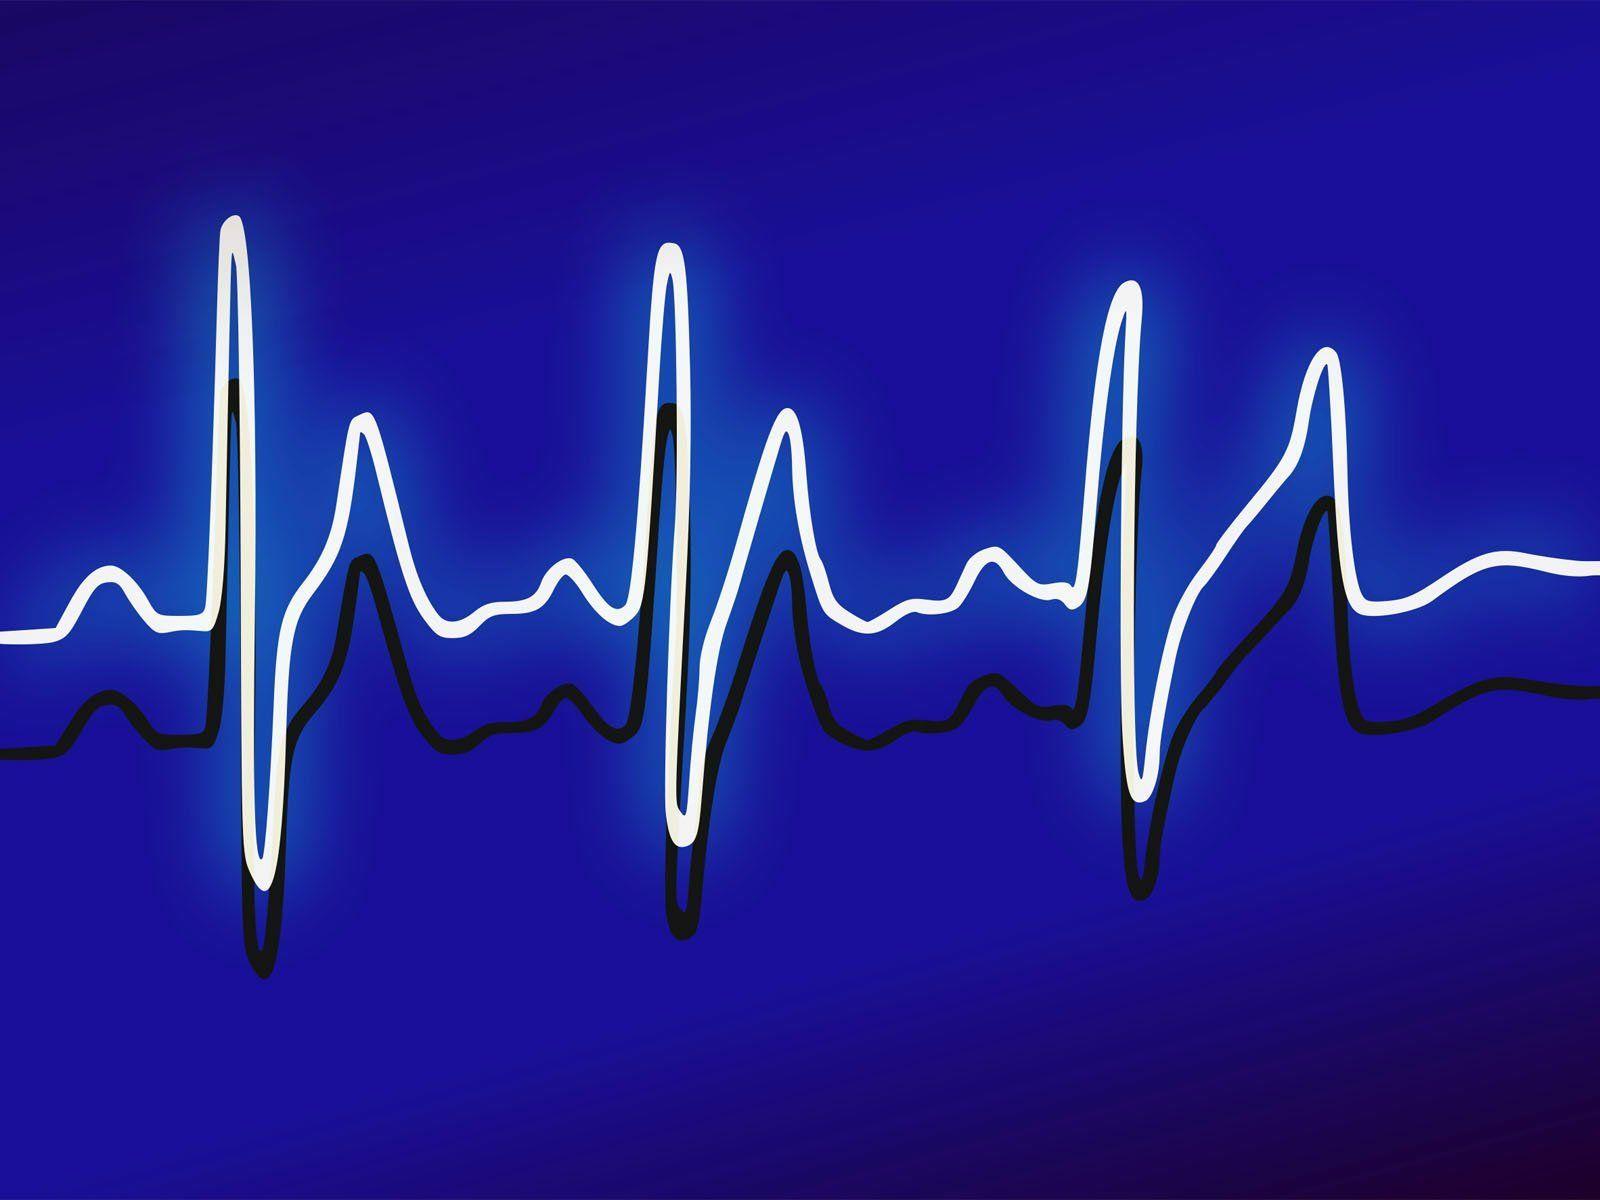 medical-pulse-ppt-background-templates-medical